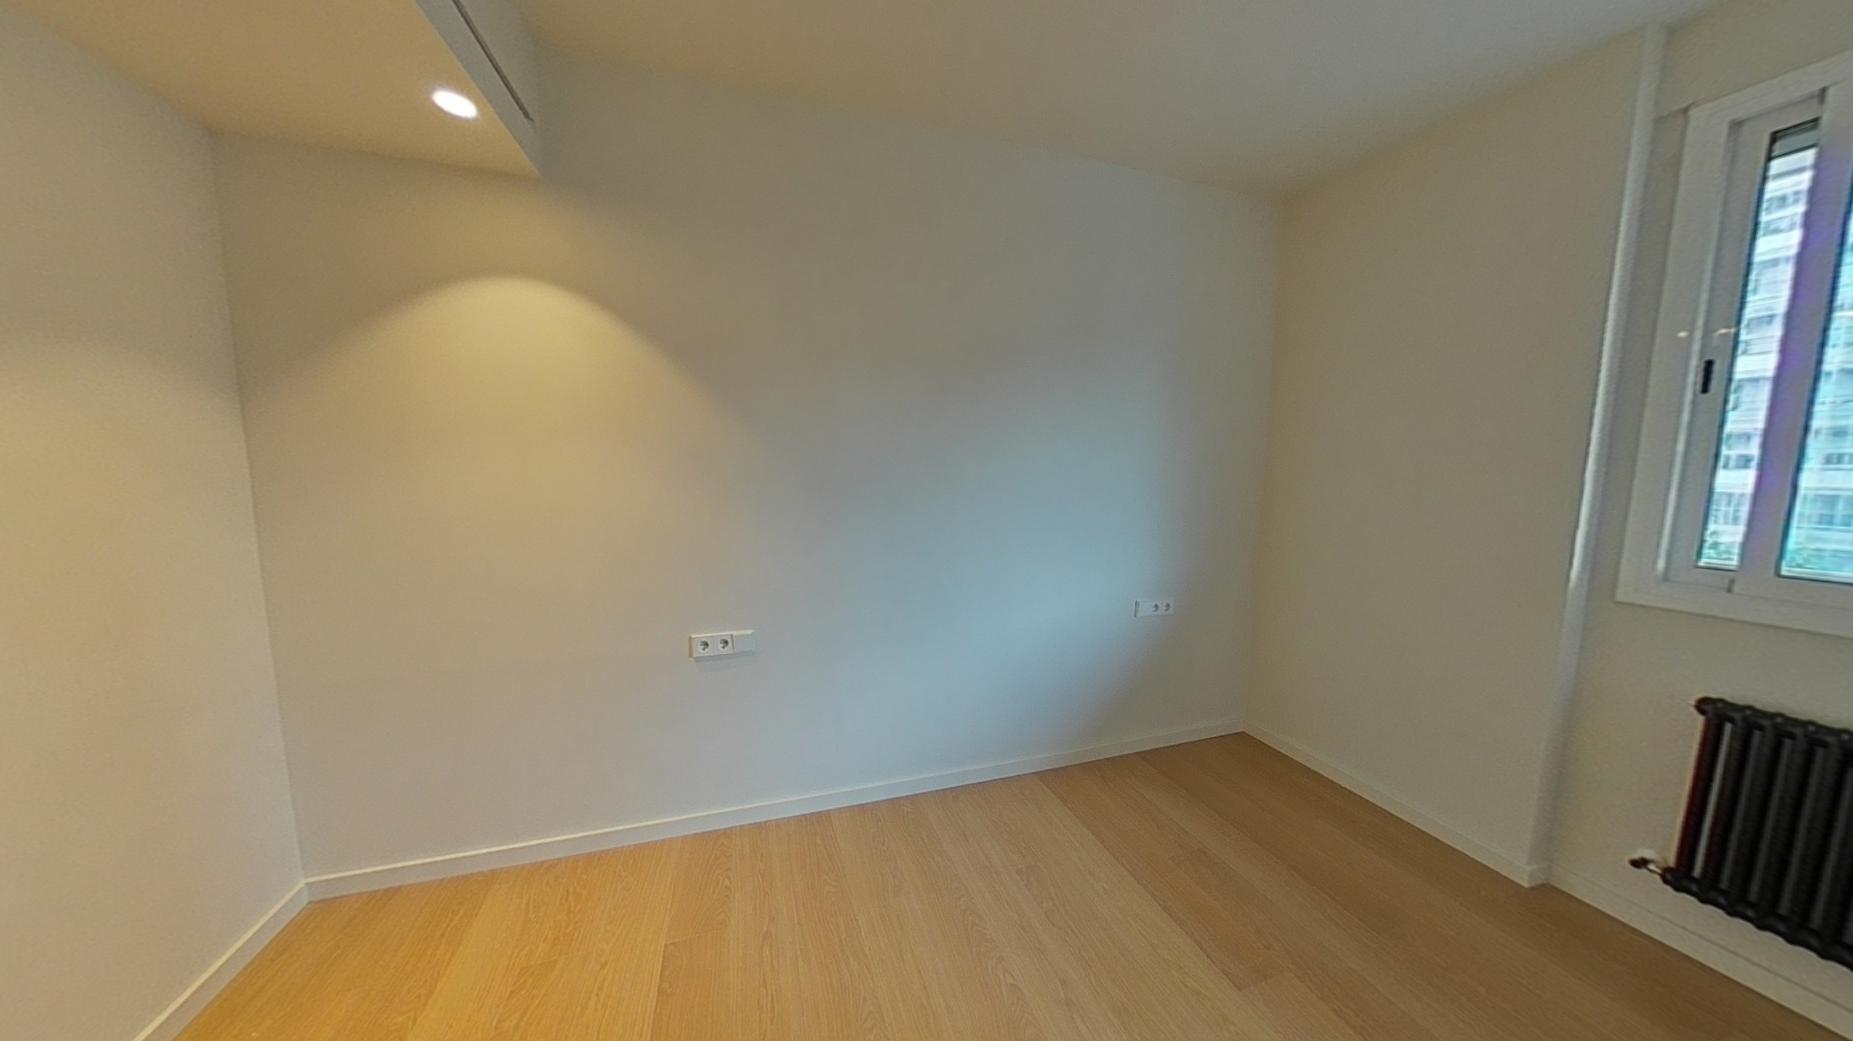 253492 Flat for sale in Sarrià-Sant Gervasi, Sant Gervasi-Galvany 22